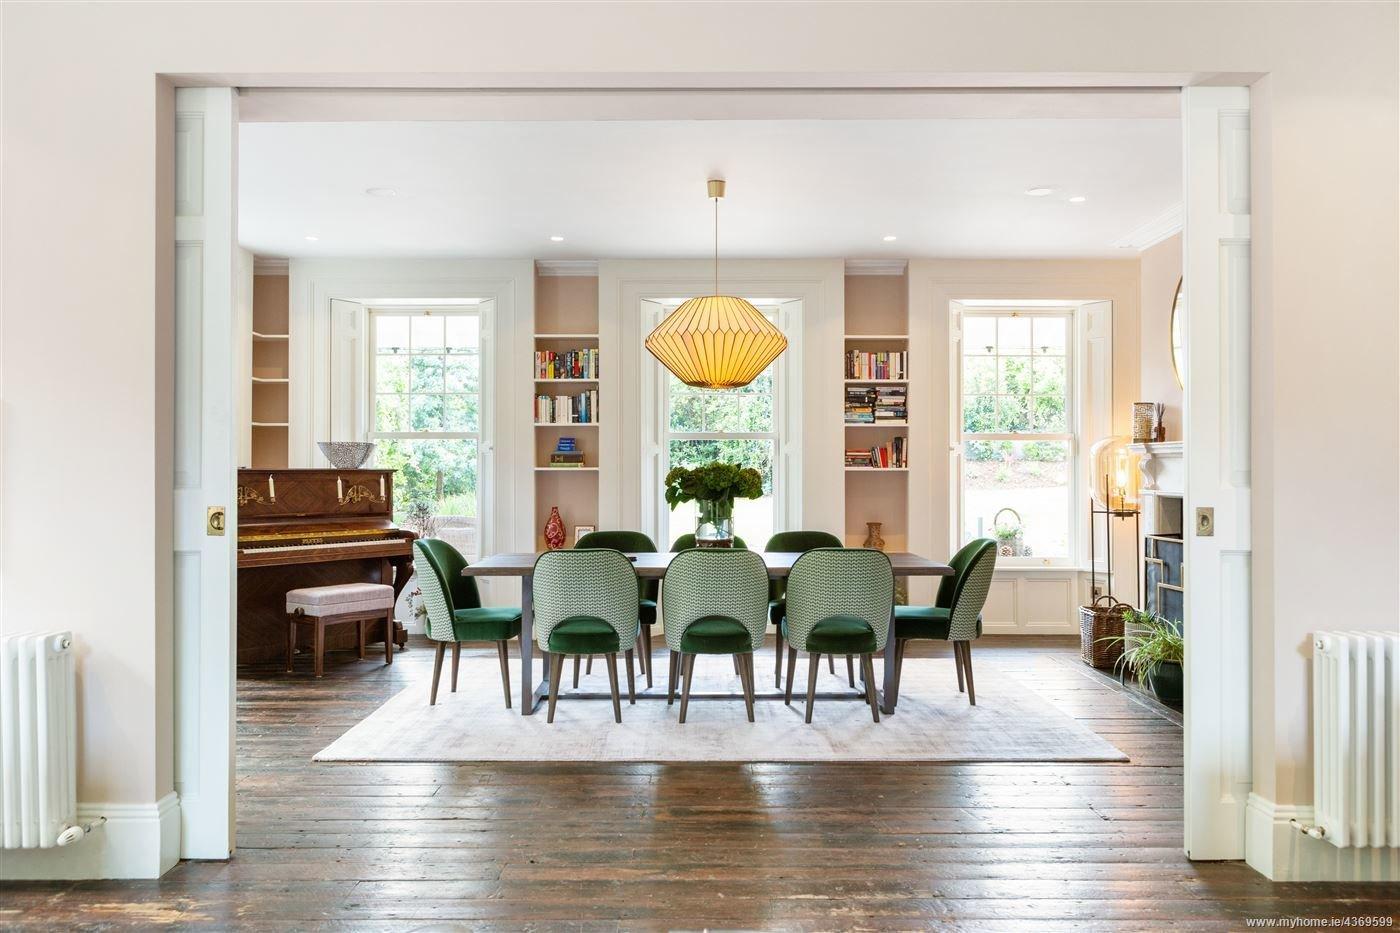 Saoirse Ronan Pine Lodge Ireland real estate dining room